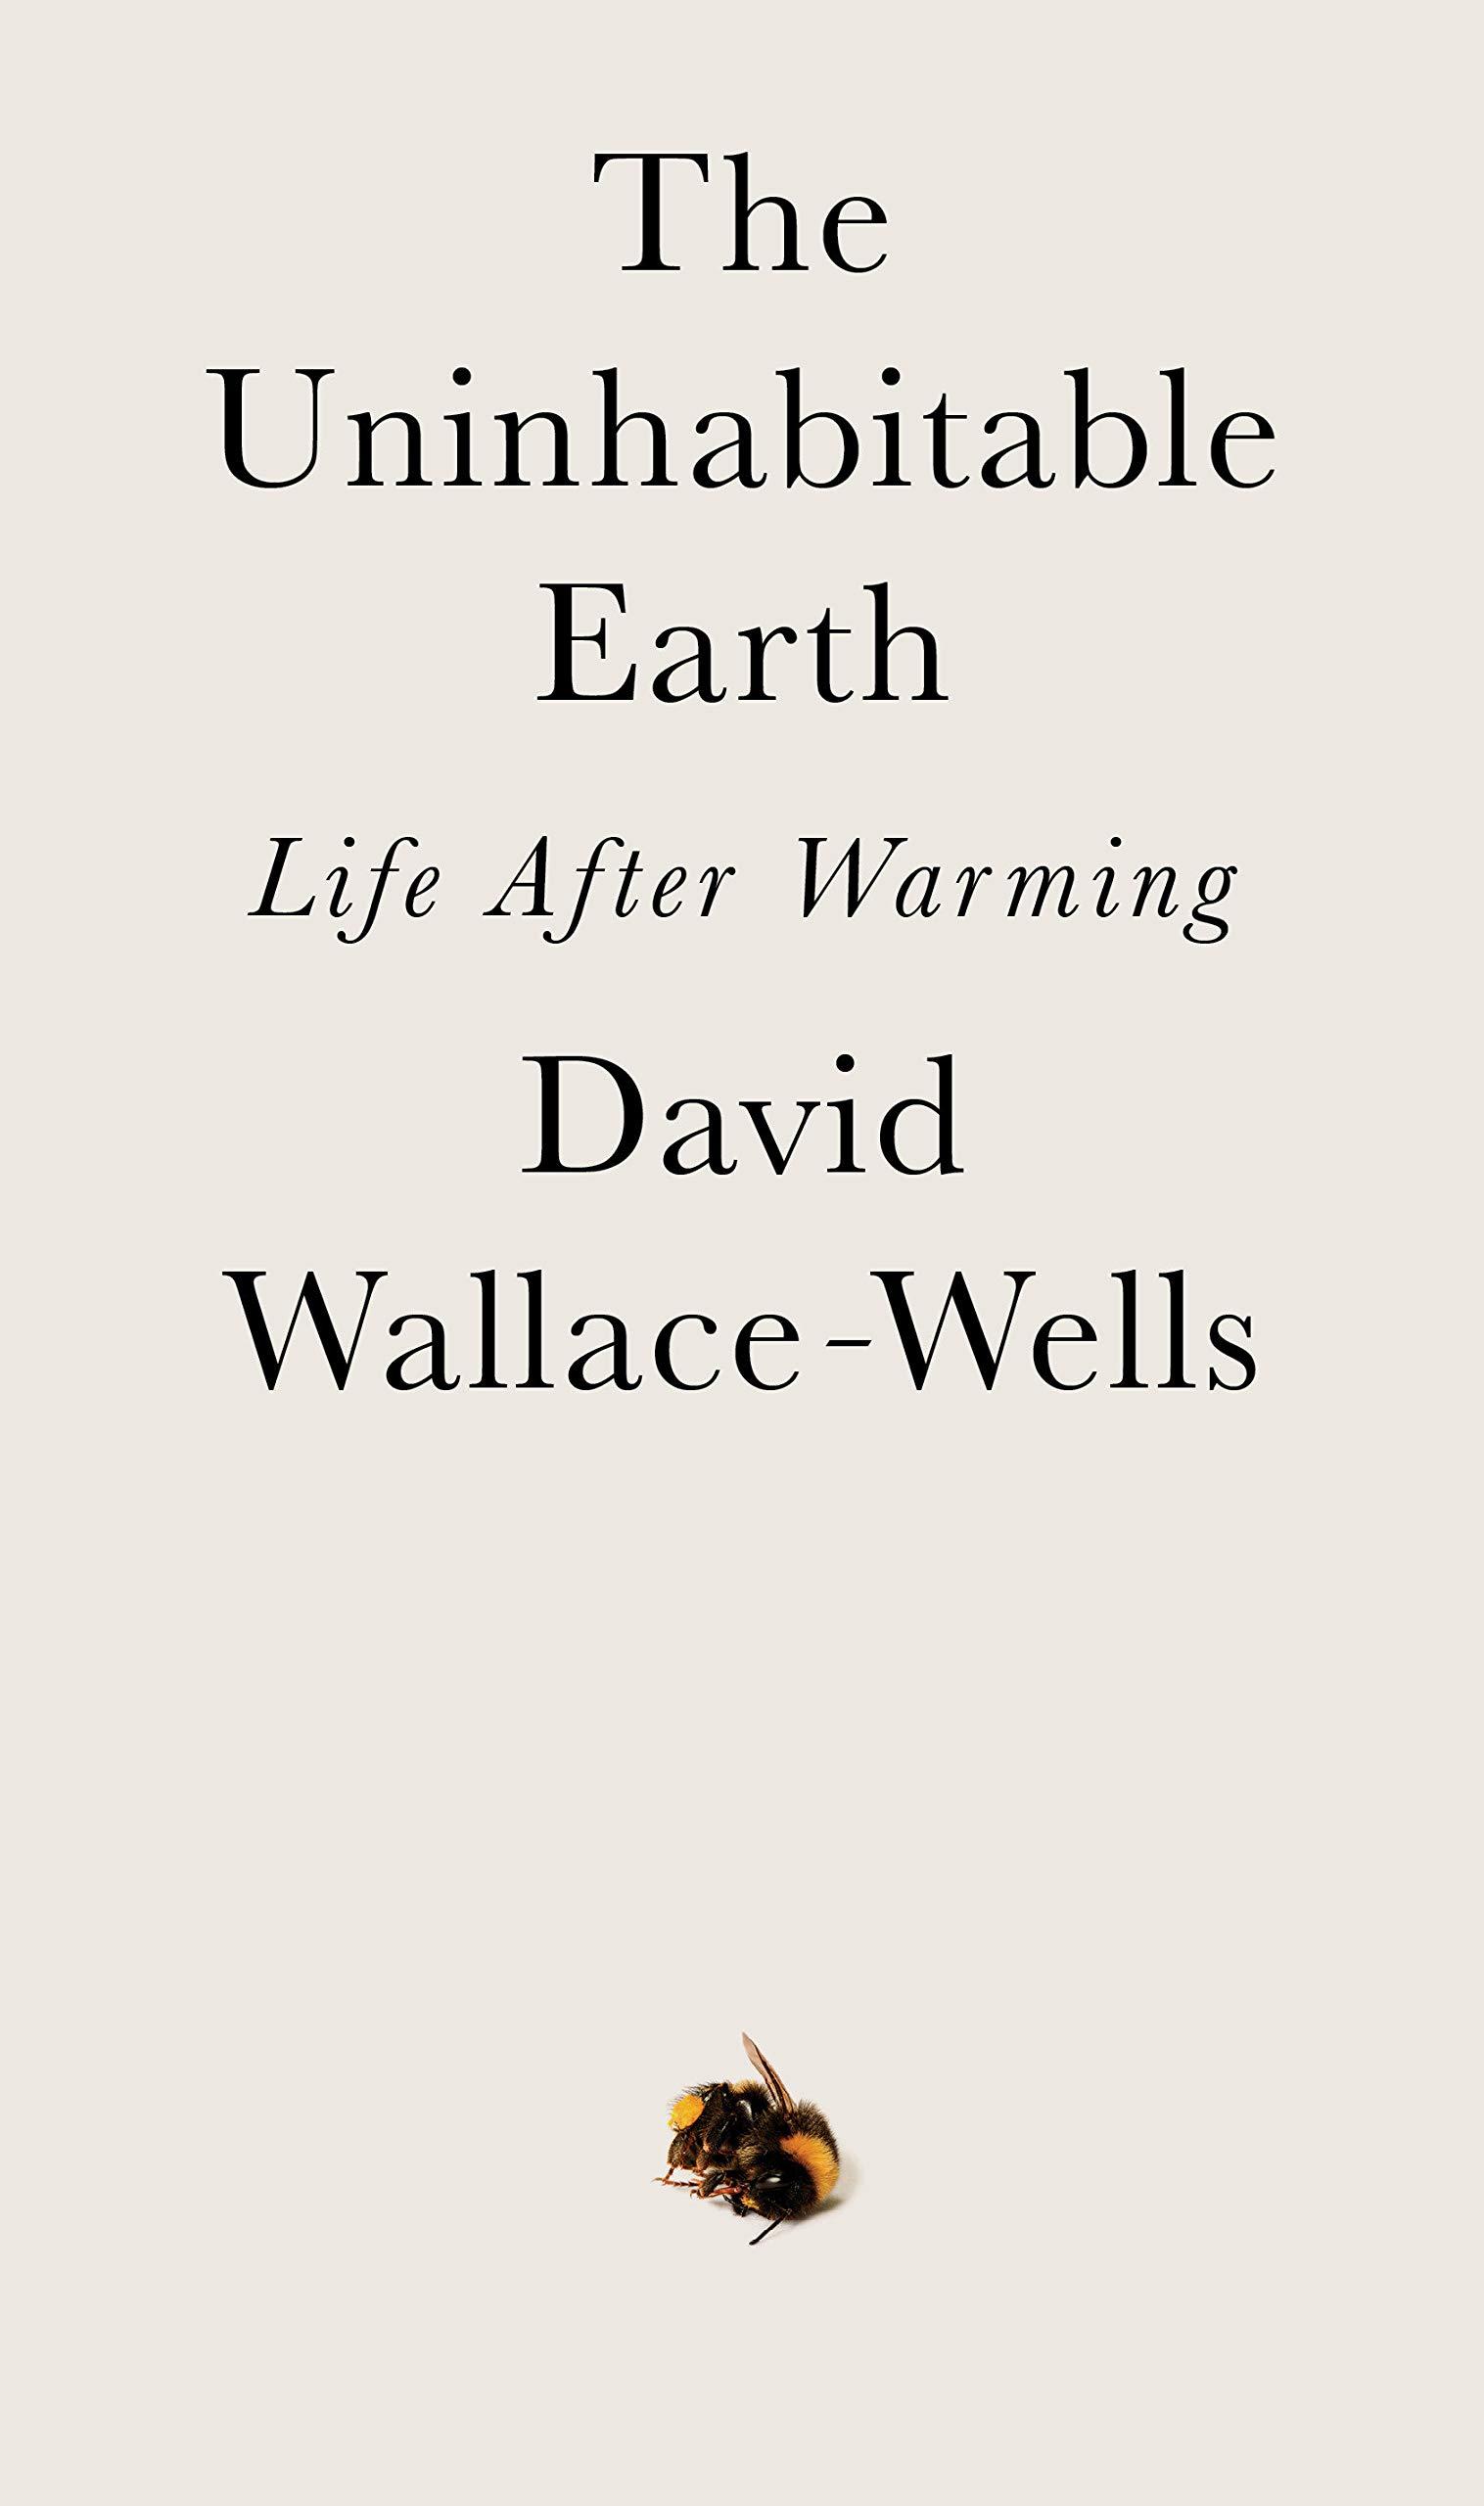 david wallace cover.jpg